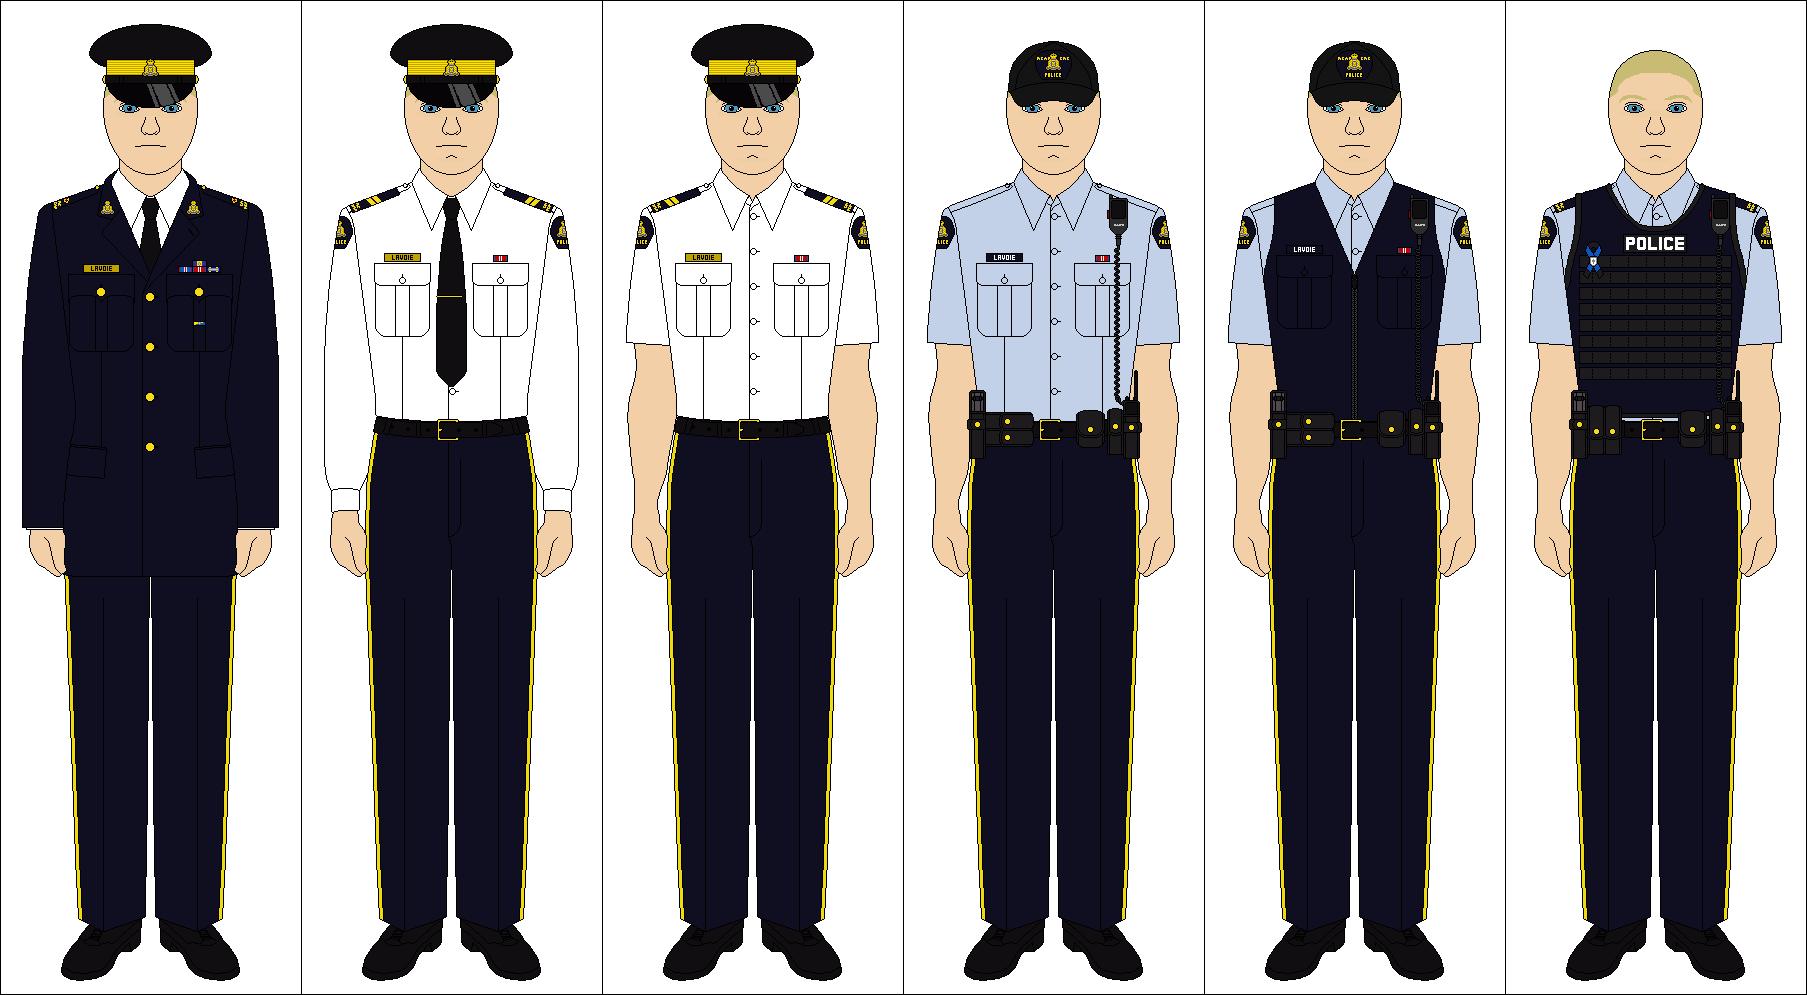 Canadian police uniform